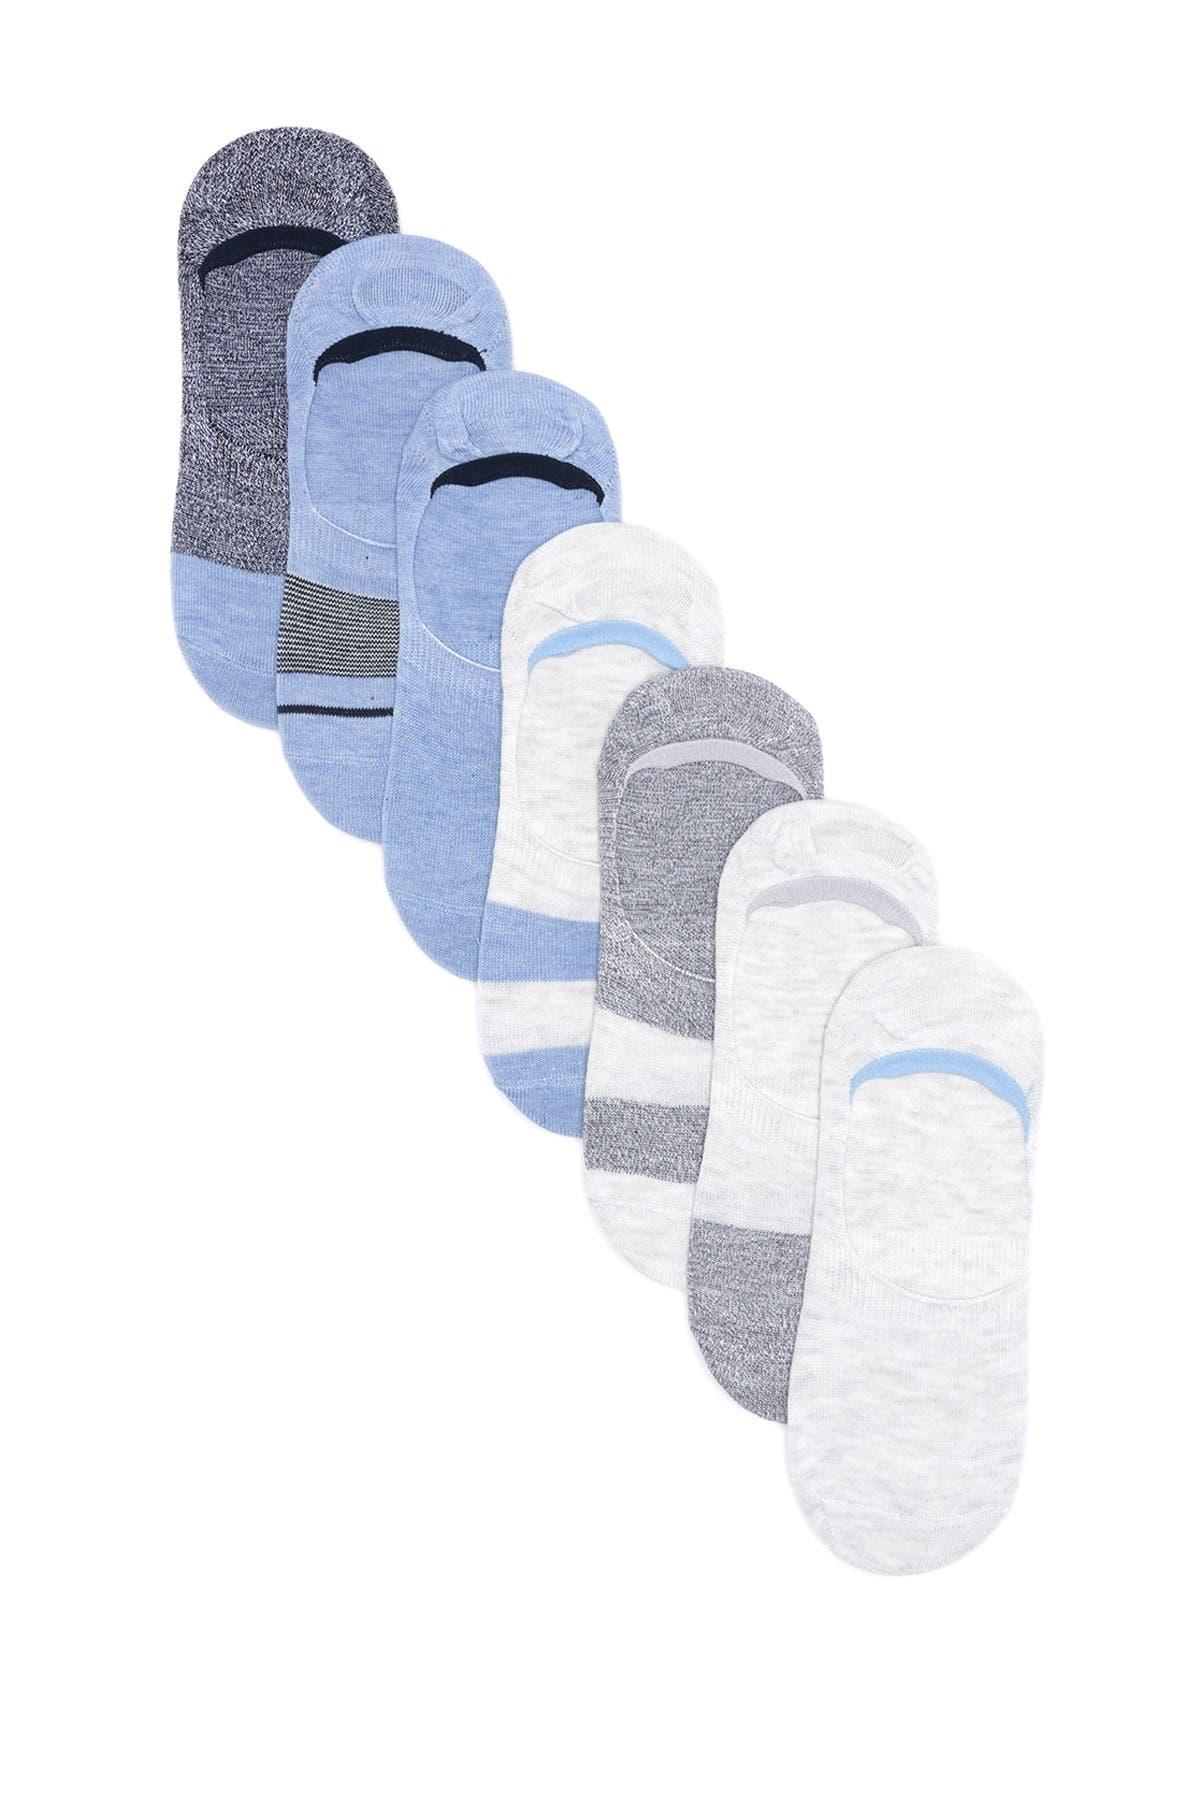 Image of RACHEL Rachel Roy Fashion Sports Liner Socks - Pack of 7